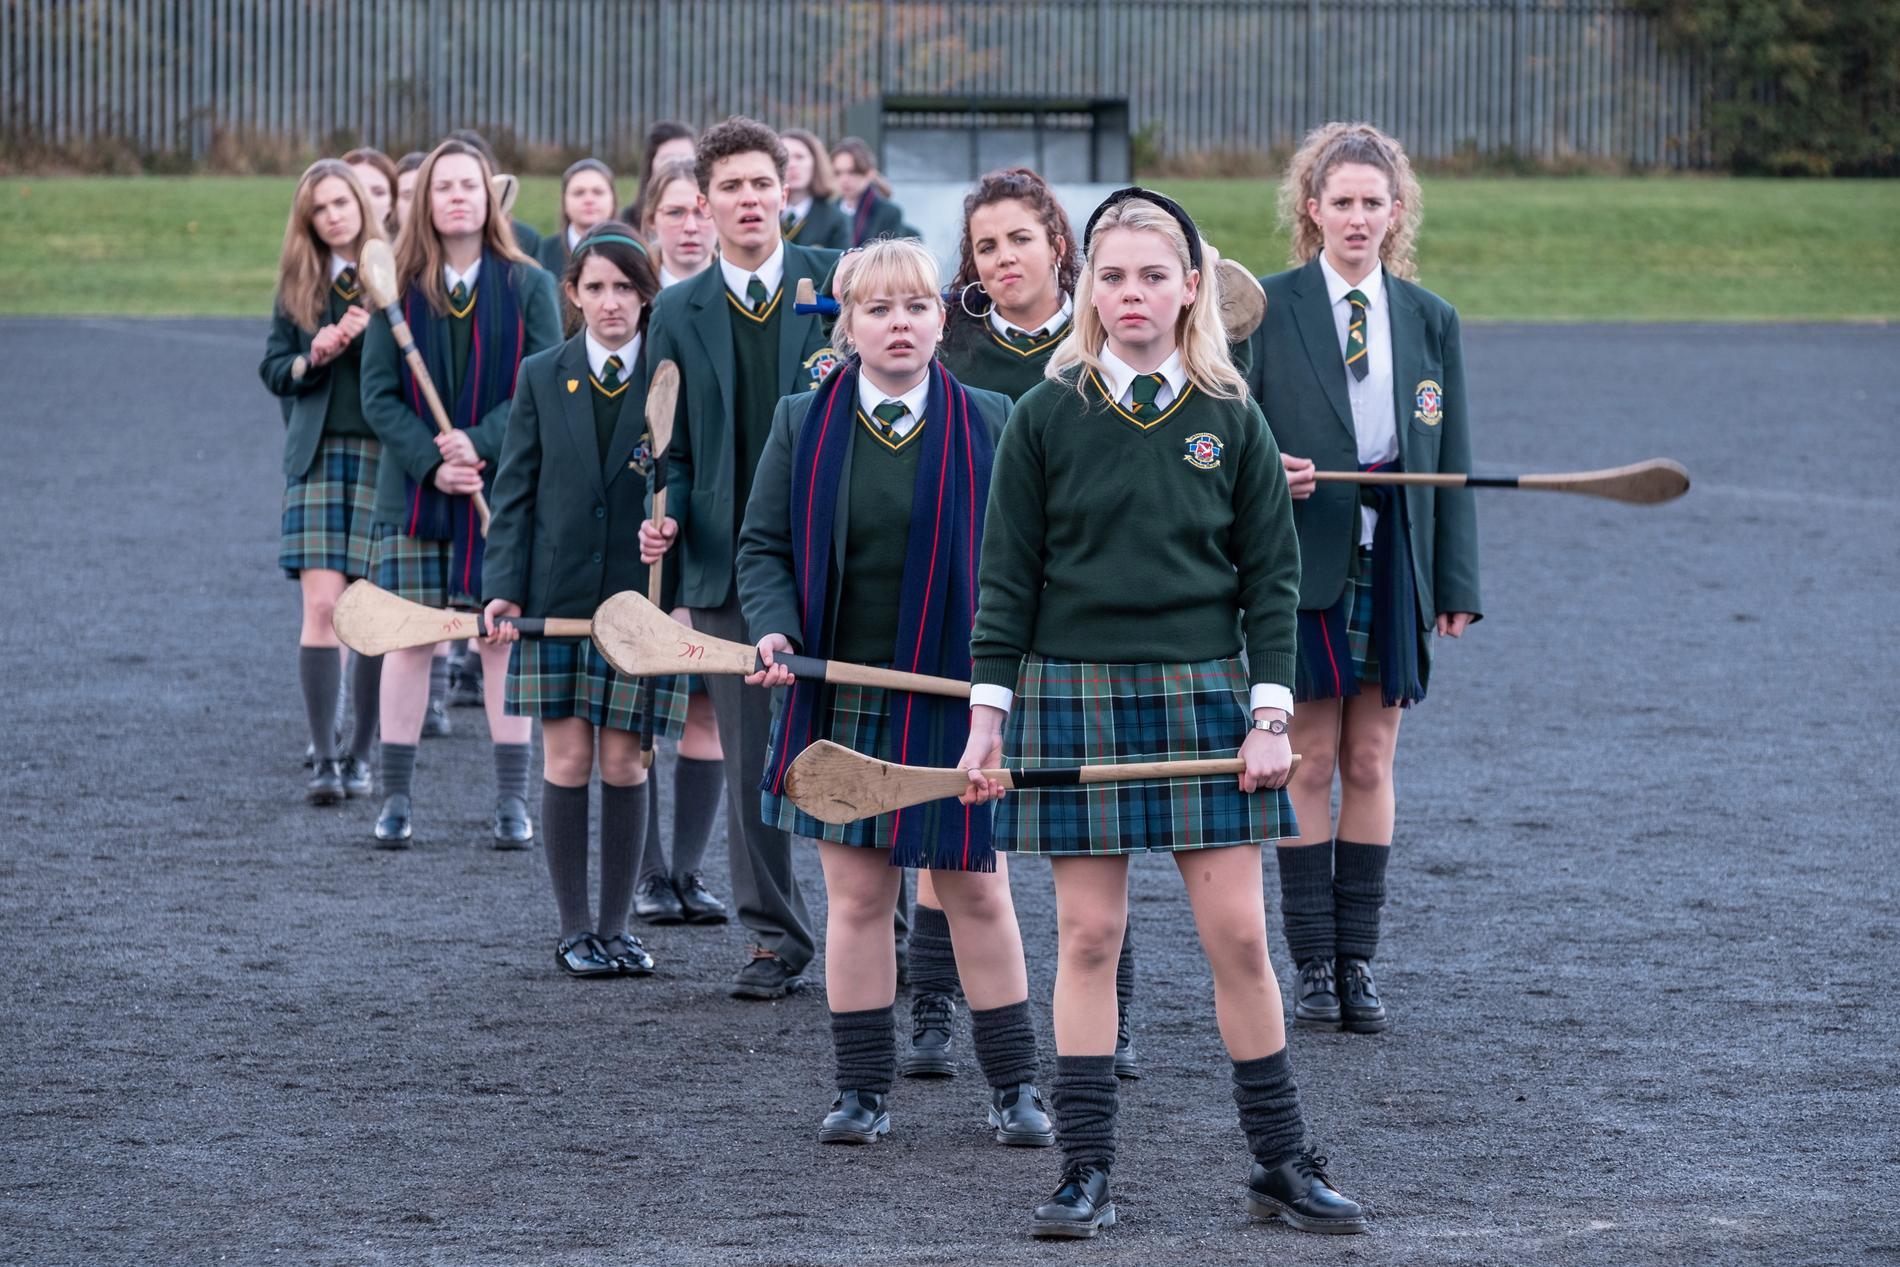 "Serien ""Derry girls"" utspelar sig i Derry i Nordirland under 1990-talet. Pressbild."